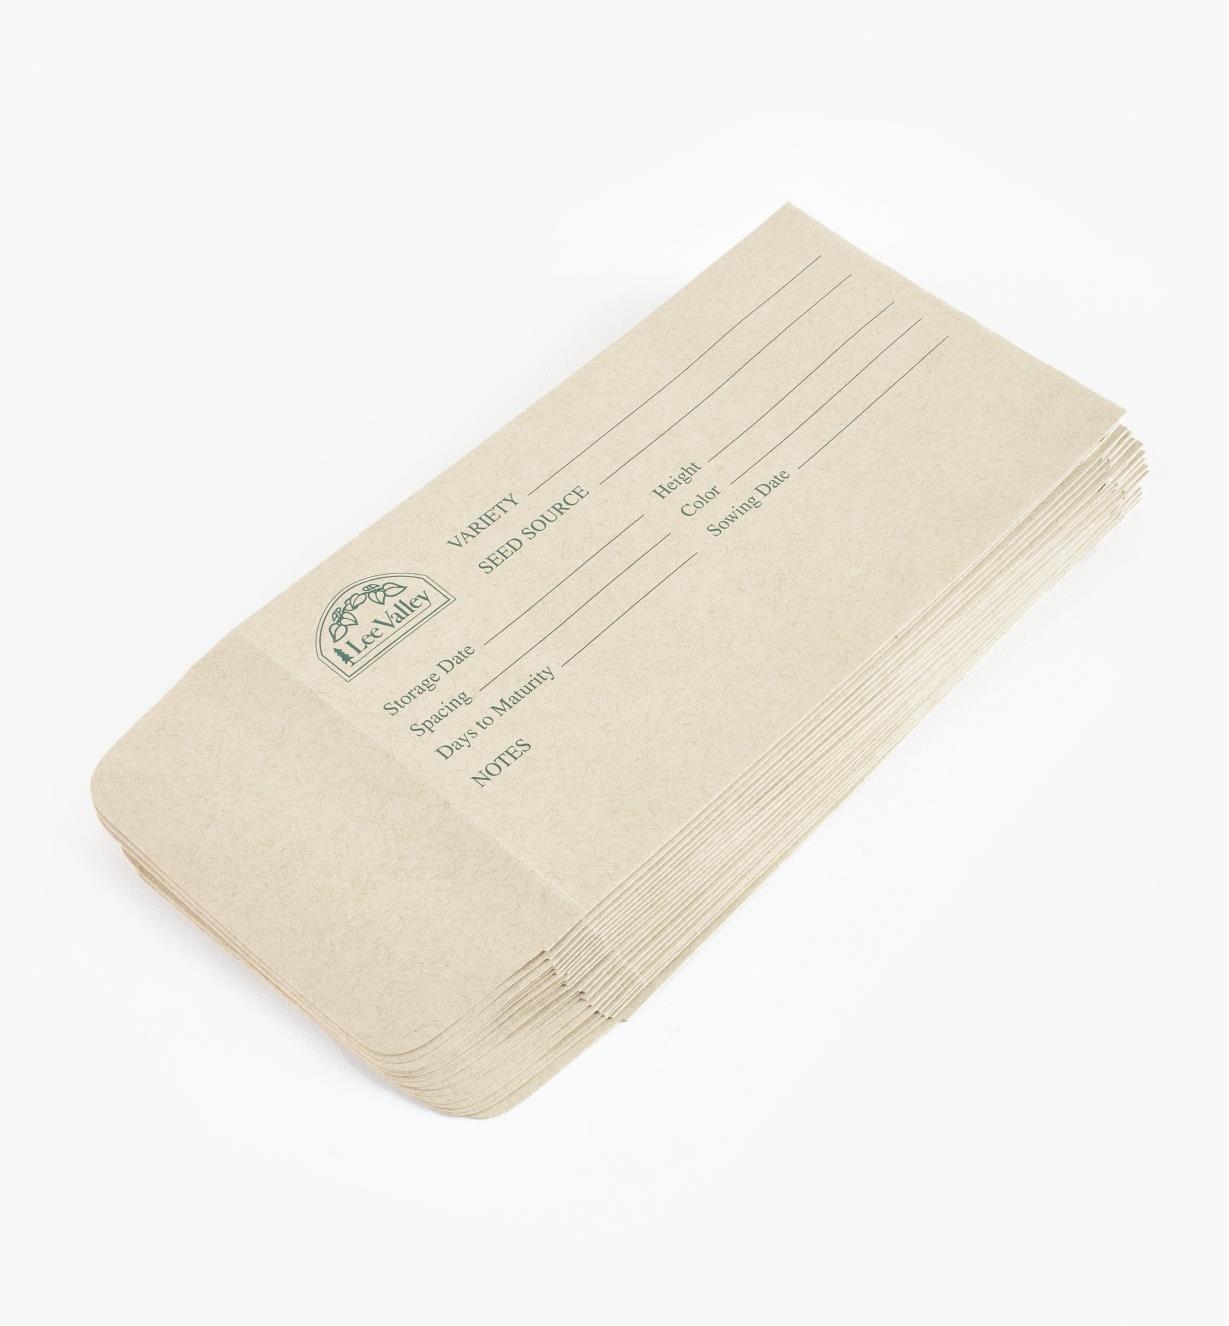 AA721 - Extra Seed Envelopes, 20